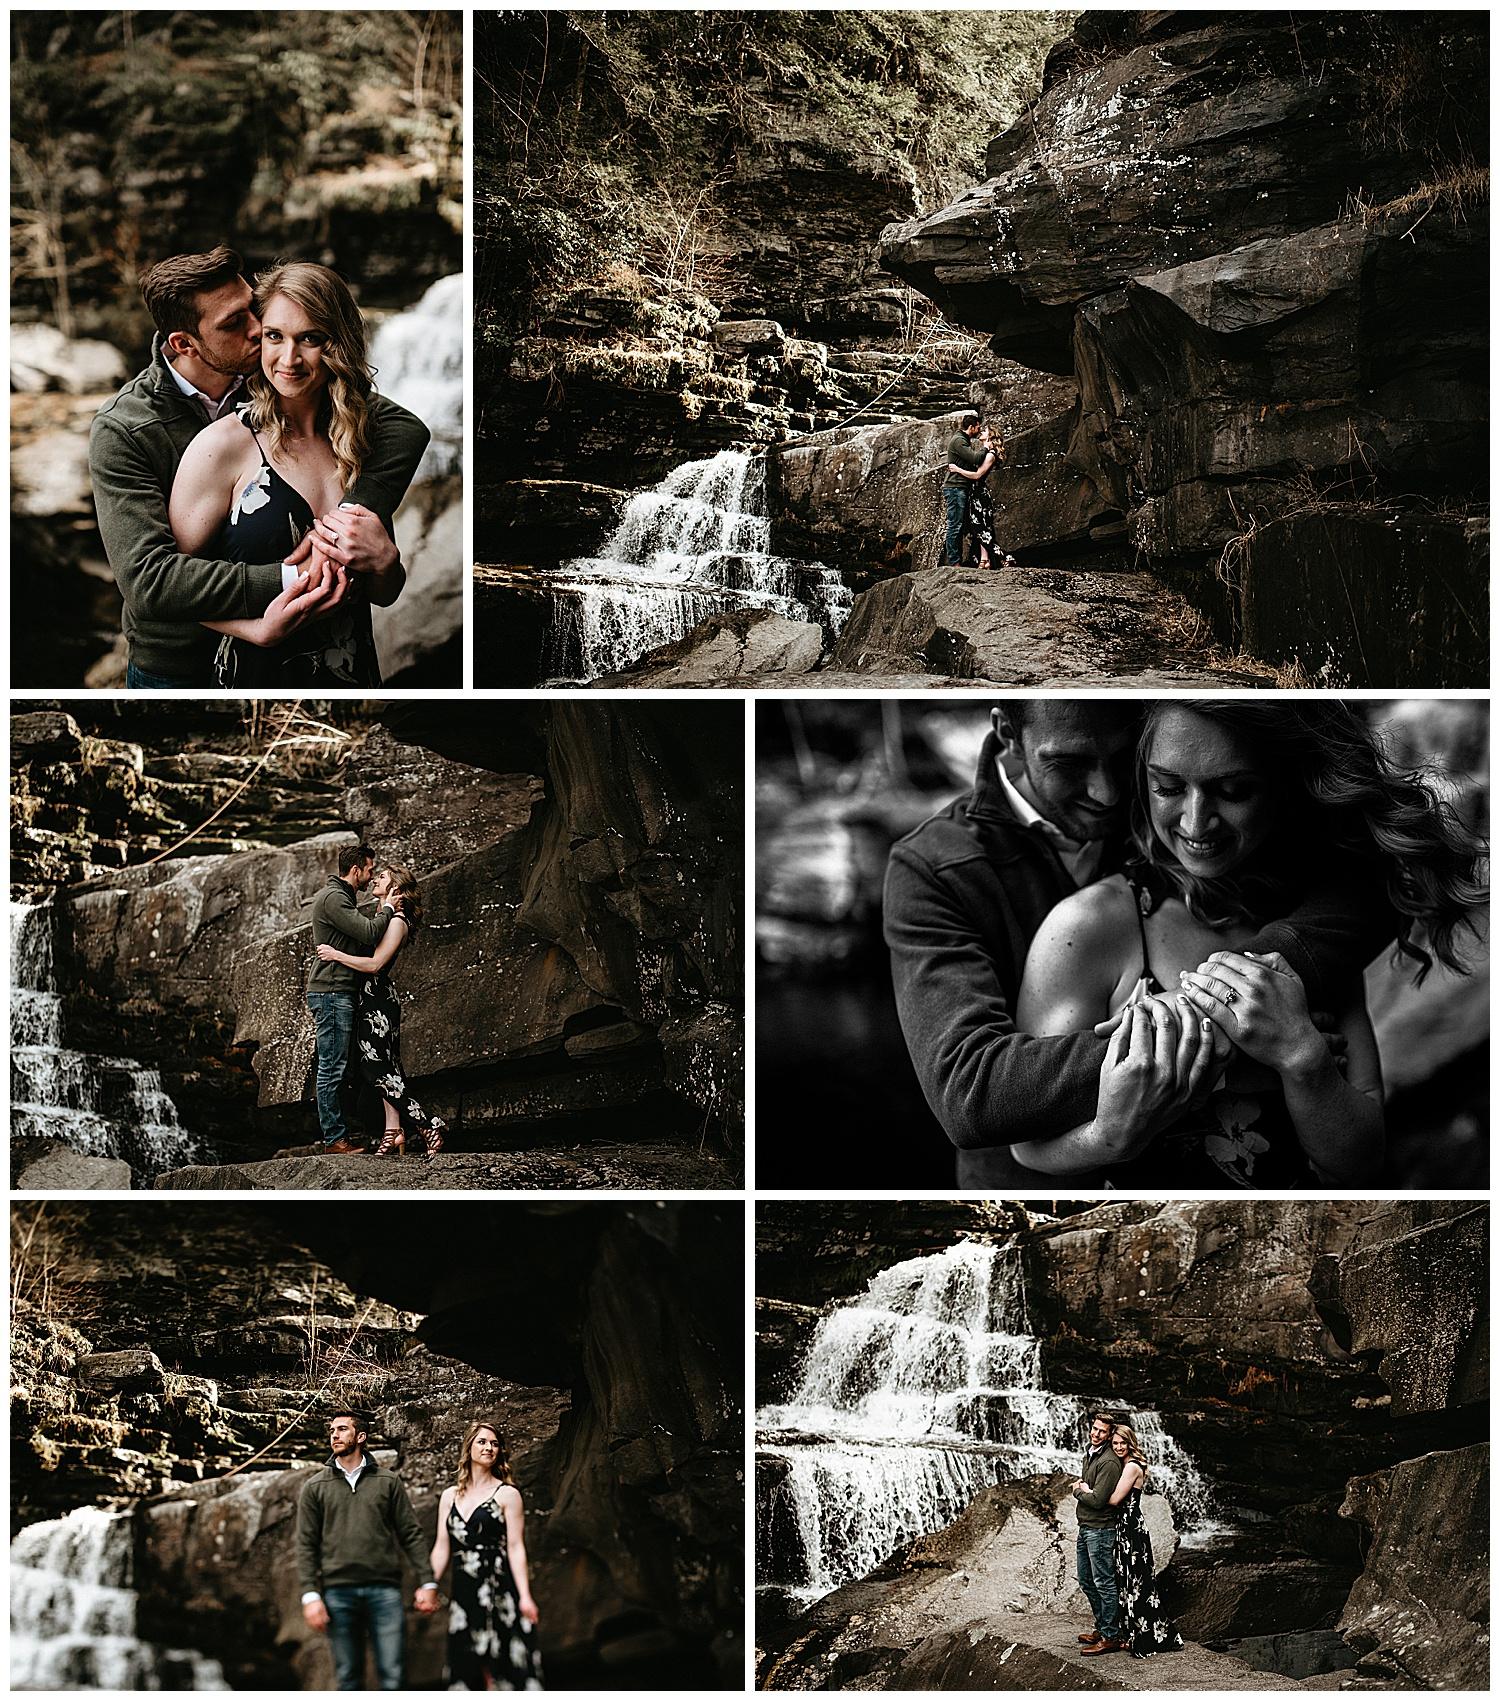 NEPA-Lehigh-Valley-Wedding-Photographer-Ledges-Hotel-Hawley-PA_0005.jpg